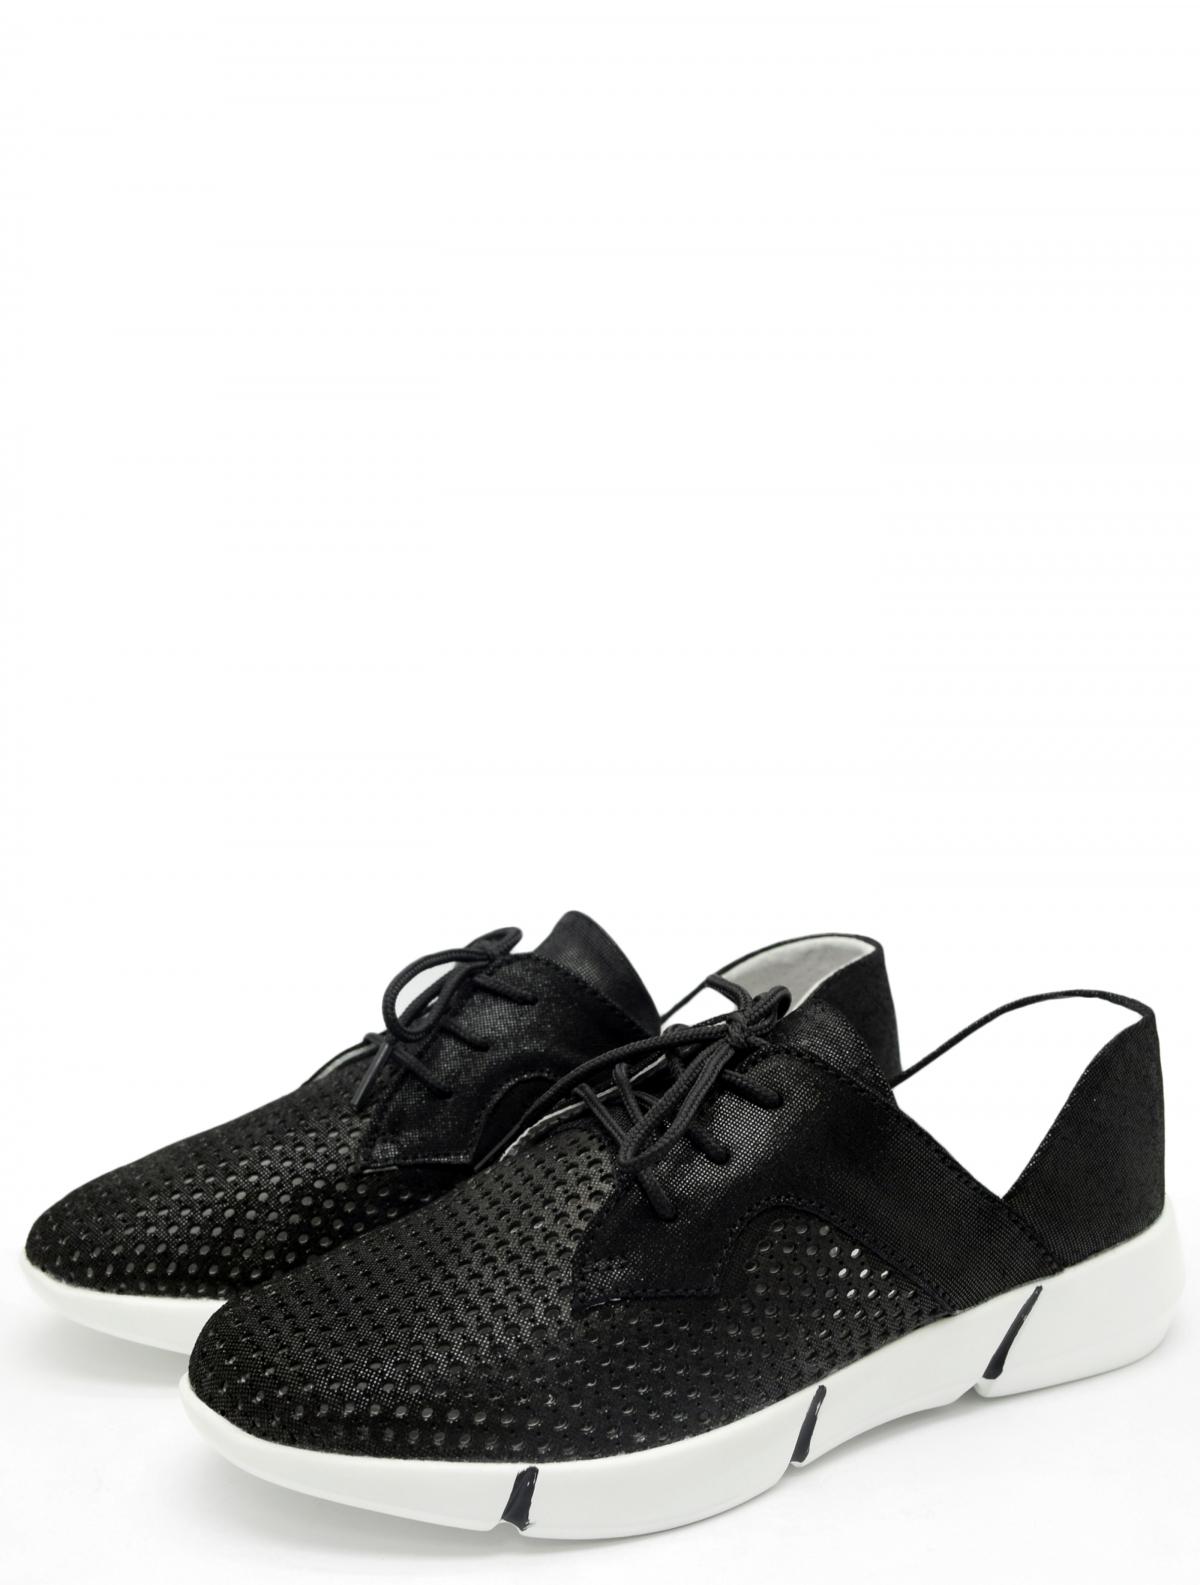 Rio Fiore JR-1801N-B женские кроссовки